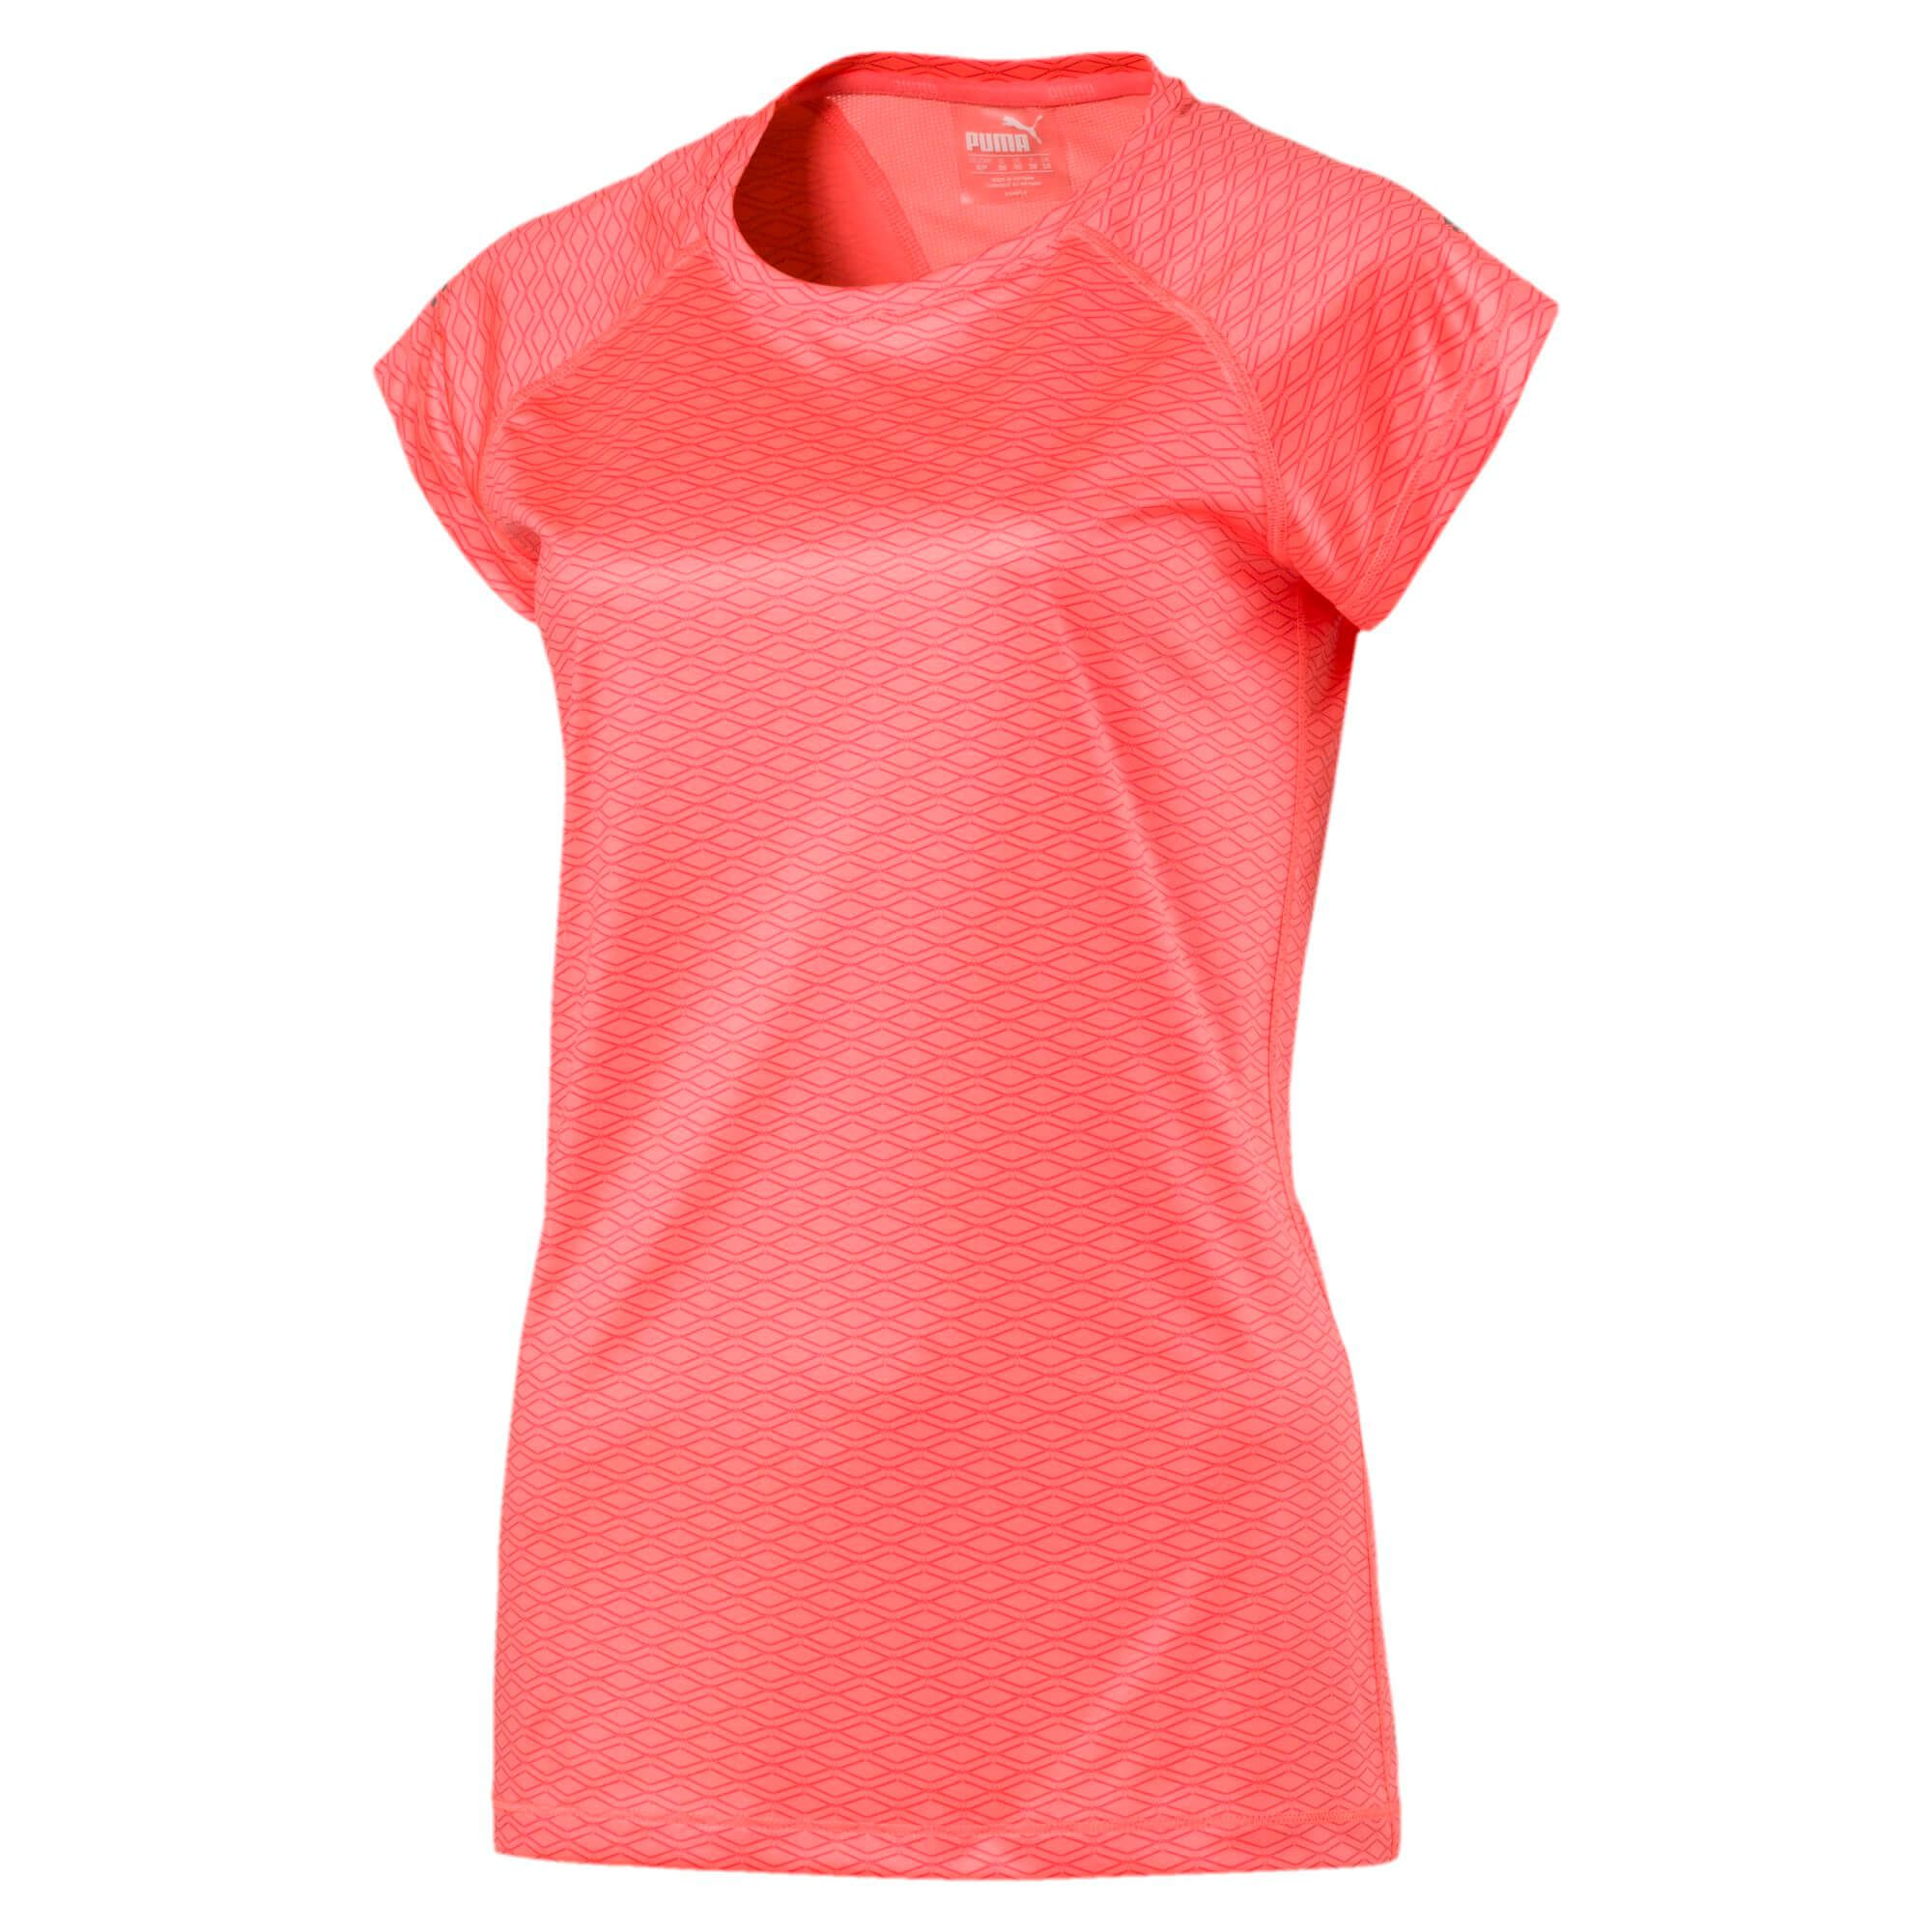 Camiseta Feminina Puma Styfr Graphic S s Tee - BRACIA SHOP  Loja de ... 6521523e0b0fa